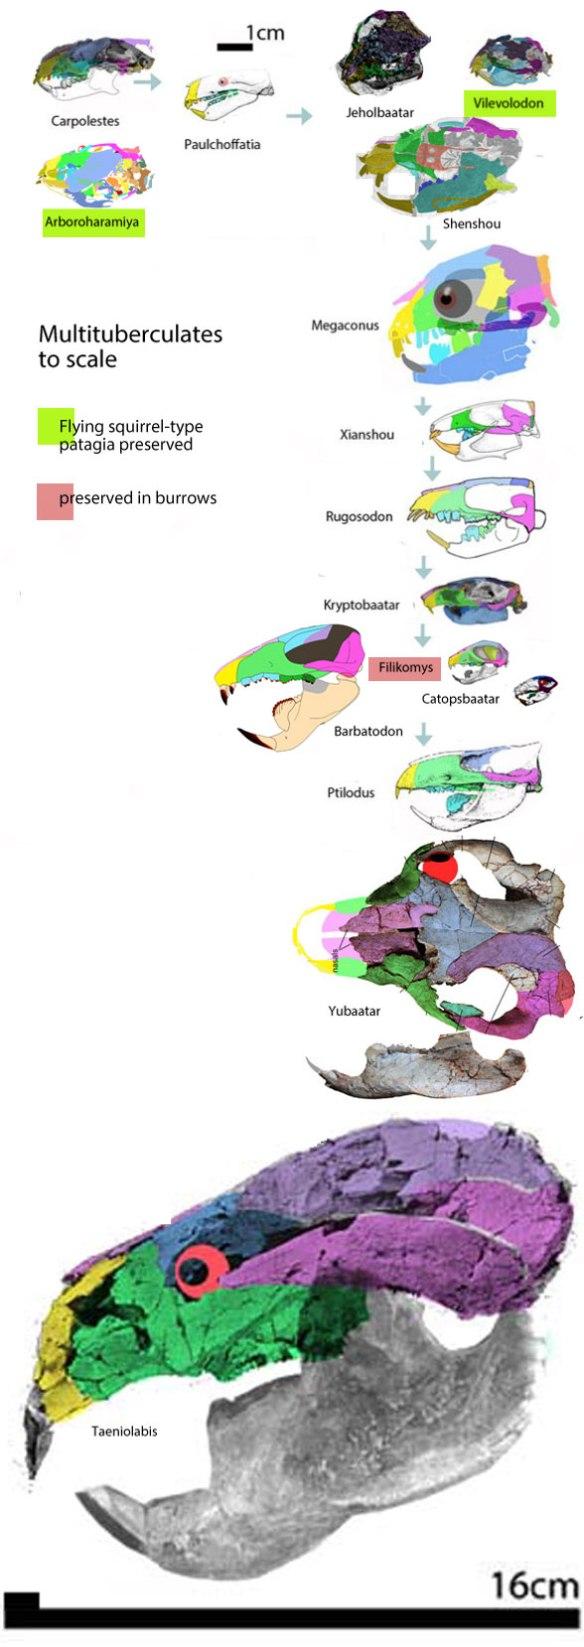 Figure 2. Multituberculates to scale. Carpolestes is the proximal outgroup taxon.